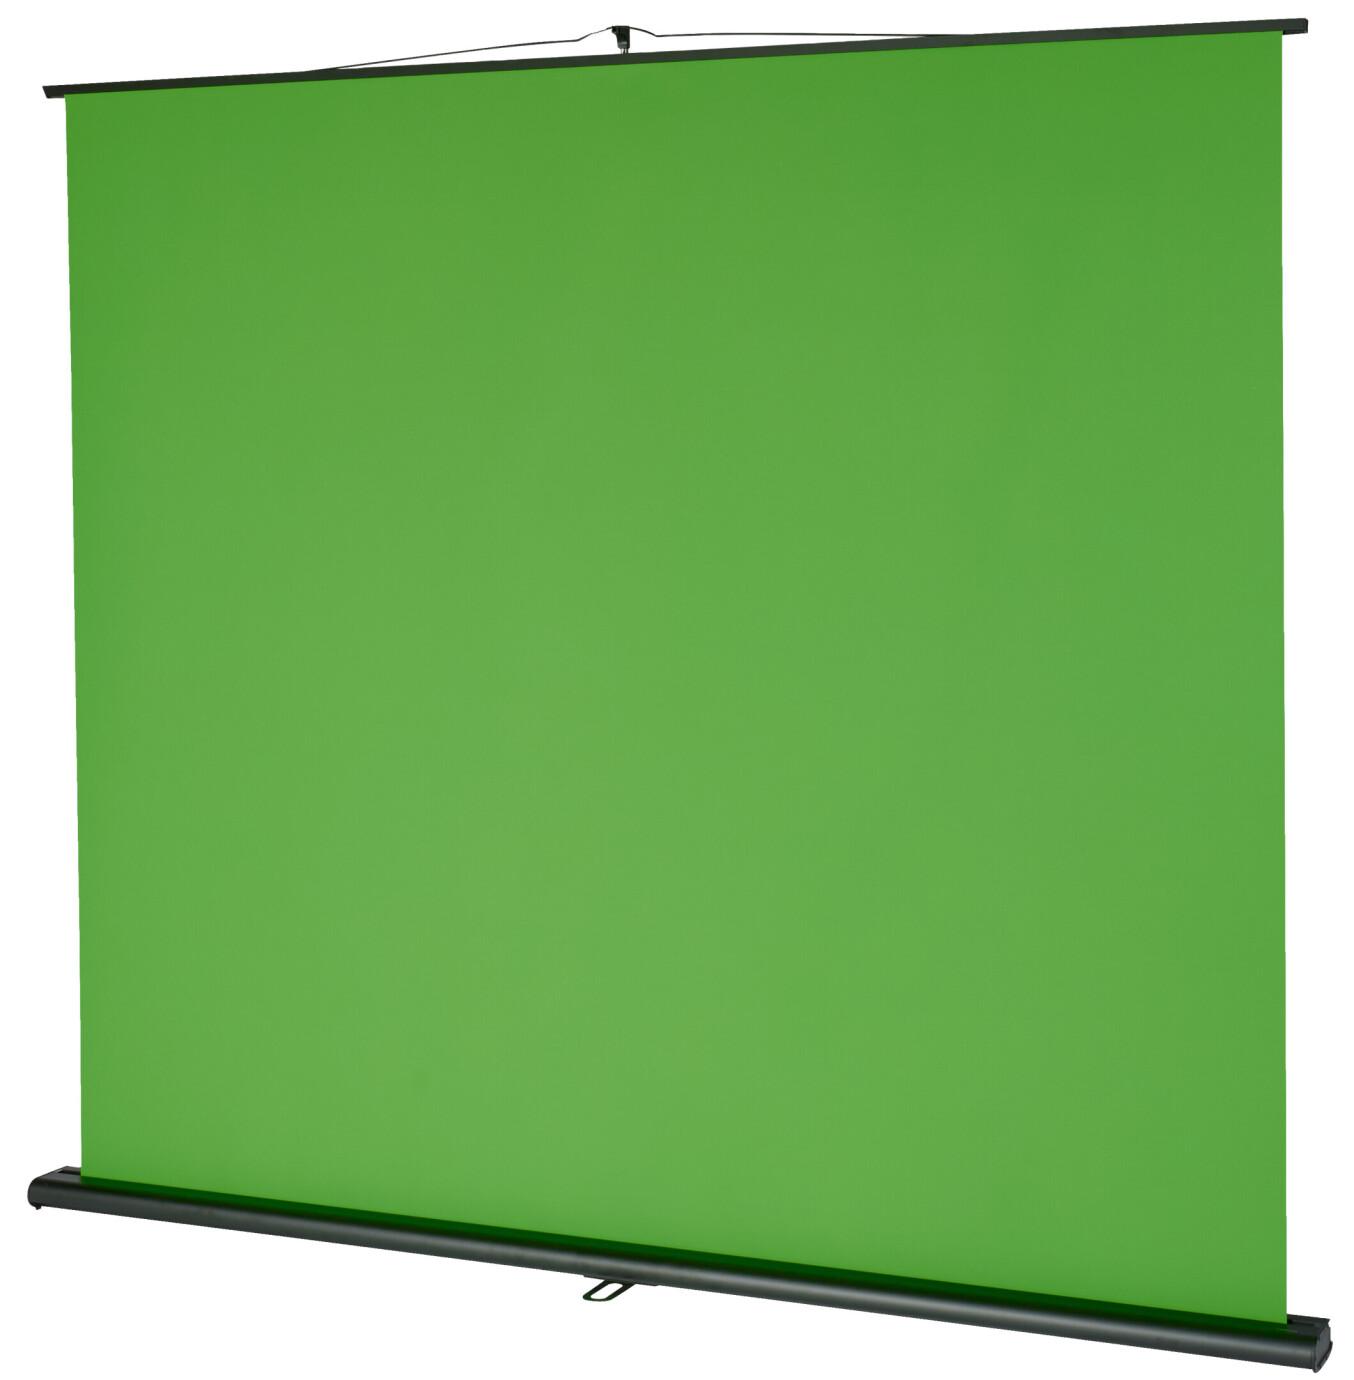 Celexon Mobile Lite Chroma Key Green Screen - 150cm (wide) x 200cm (Tall)